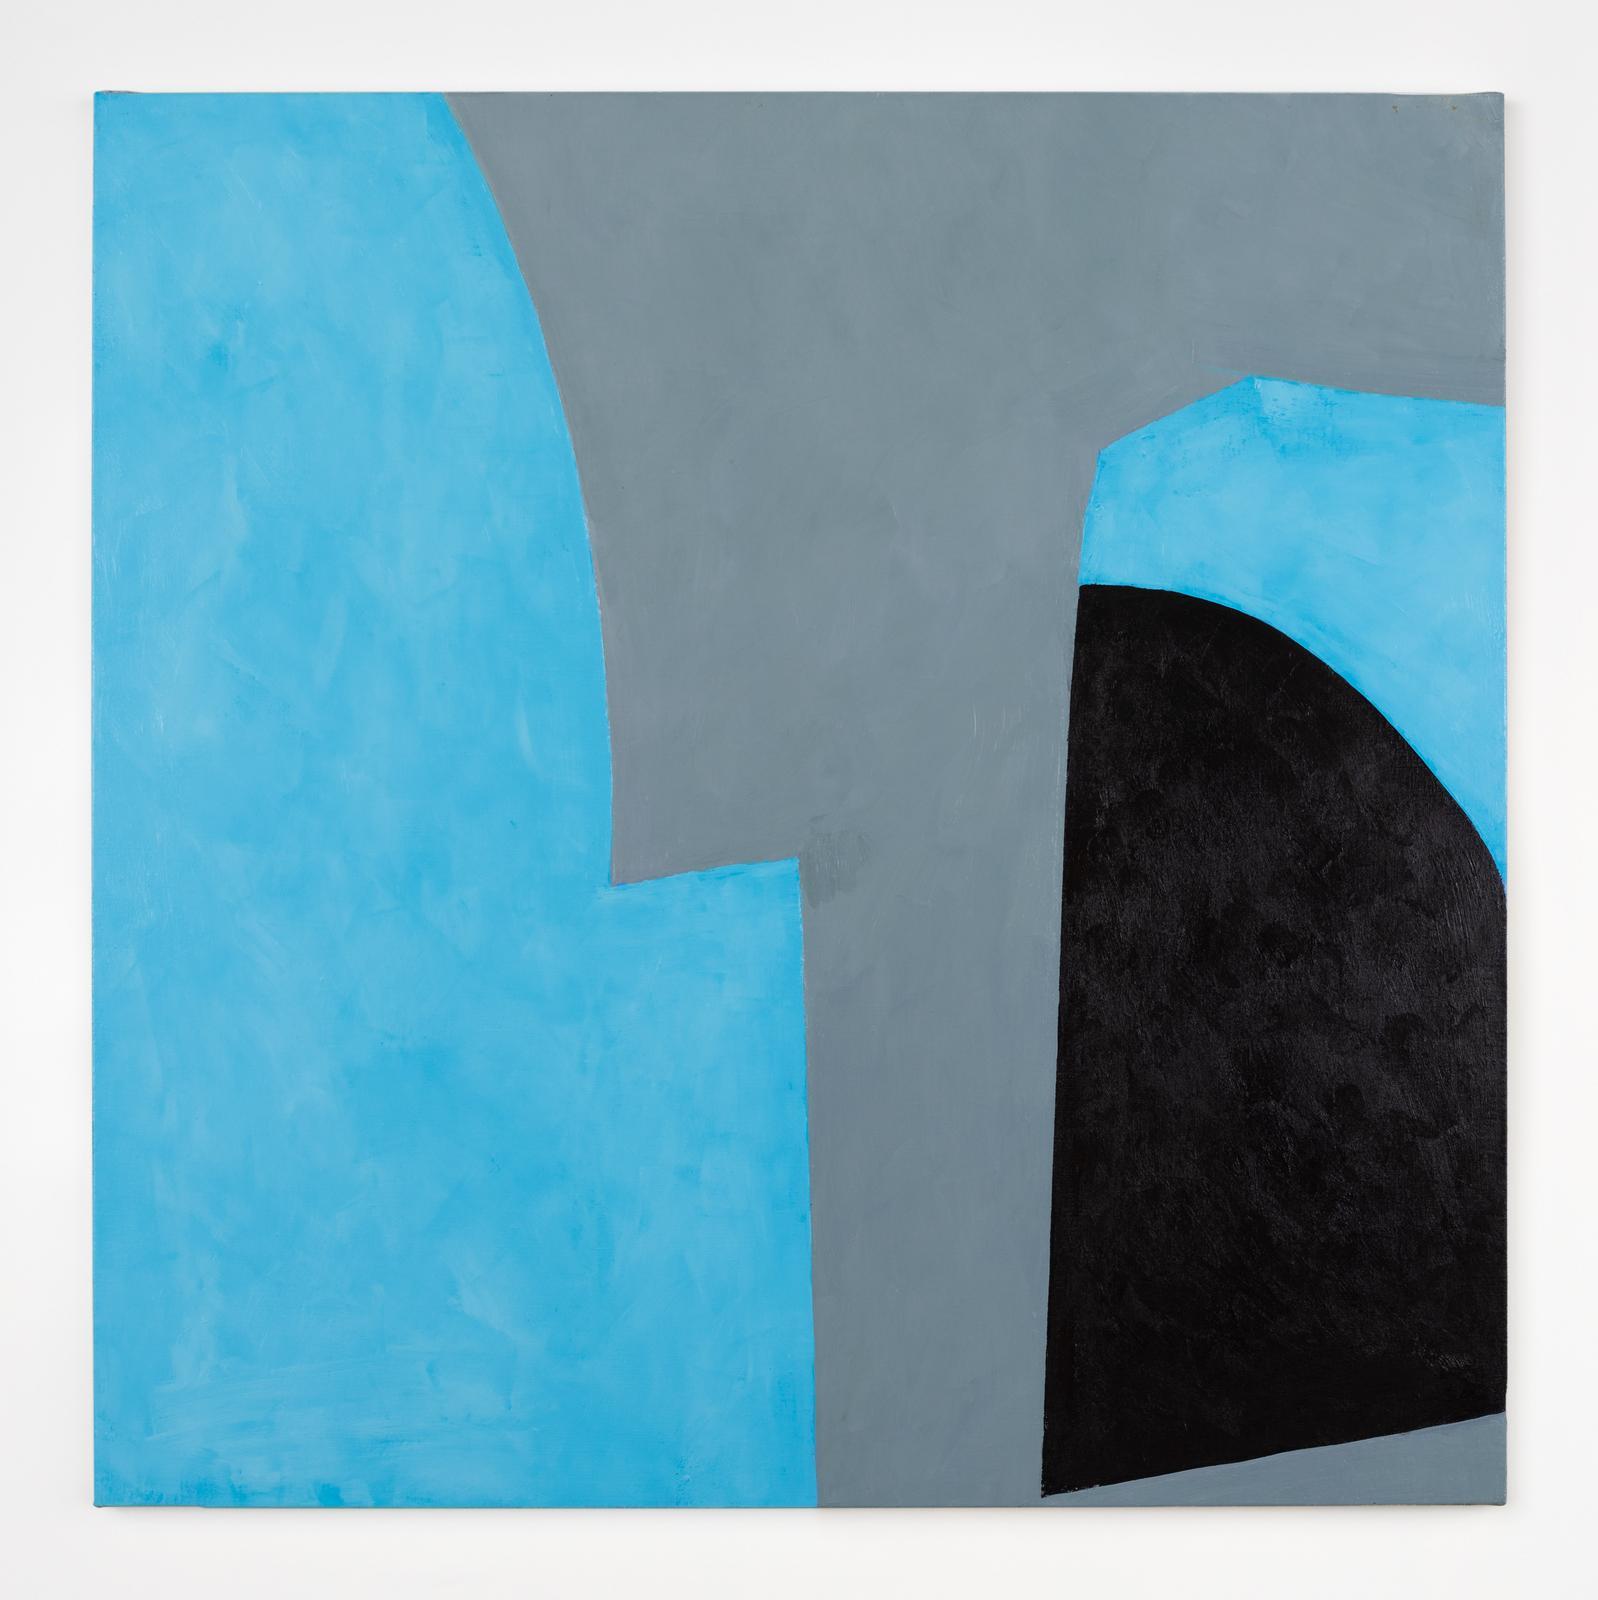 Richard Gorman, Echo Delta, 2020, oil on linen, 100 x 100 cm / 39.4 x 39.4 in | Richard Gorman: dalkey 2 | Tuesday 16 June  – Saturday 15 August 2020 | Kerlin Gallery